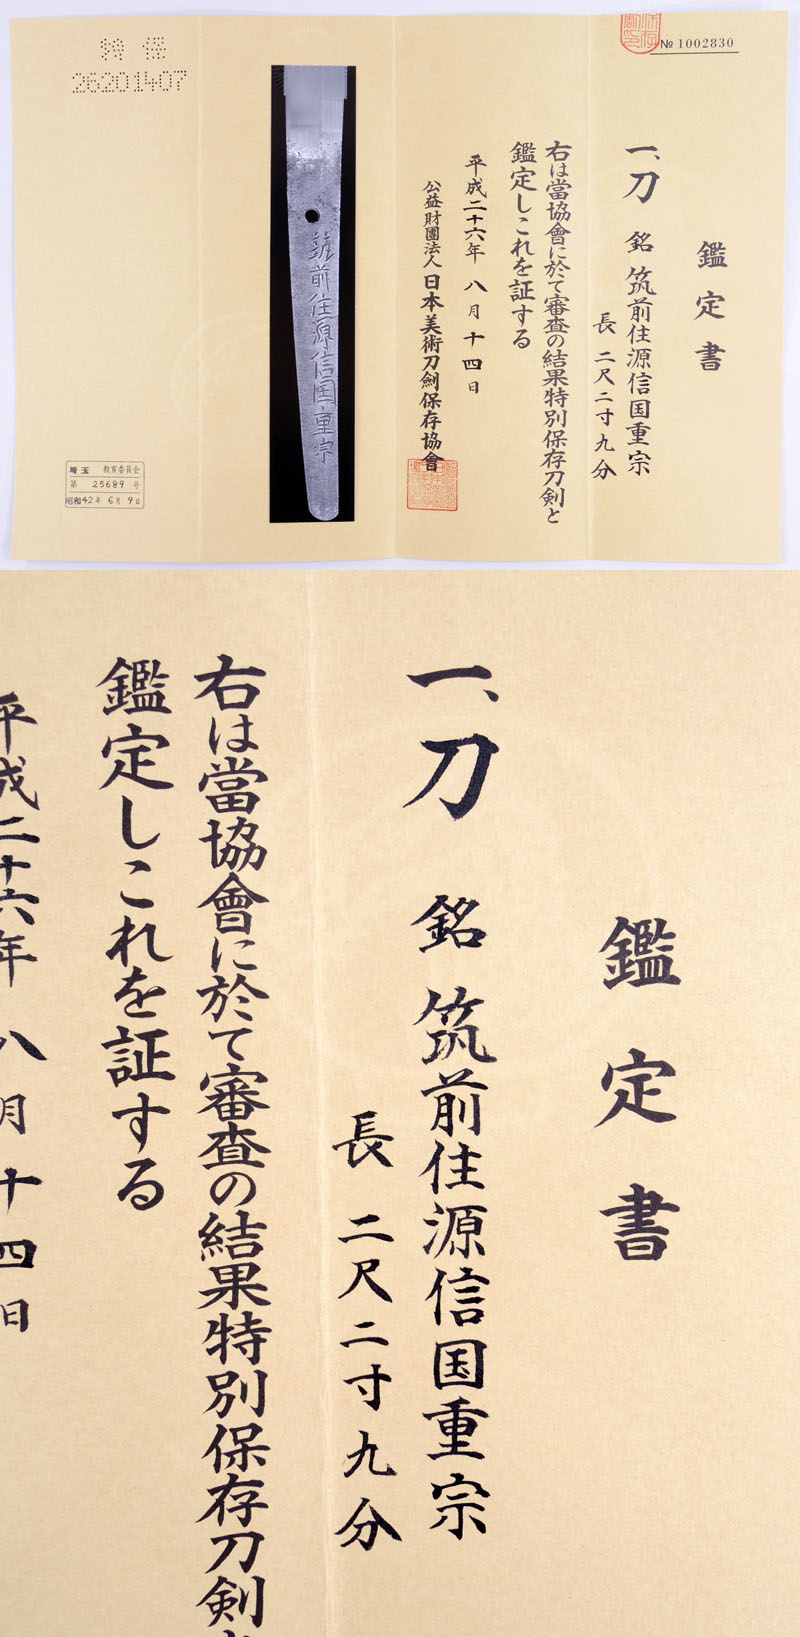 筑前住源信国重宗 Picture of Certificate